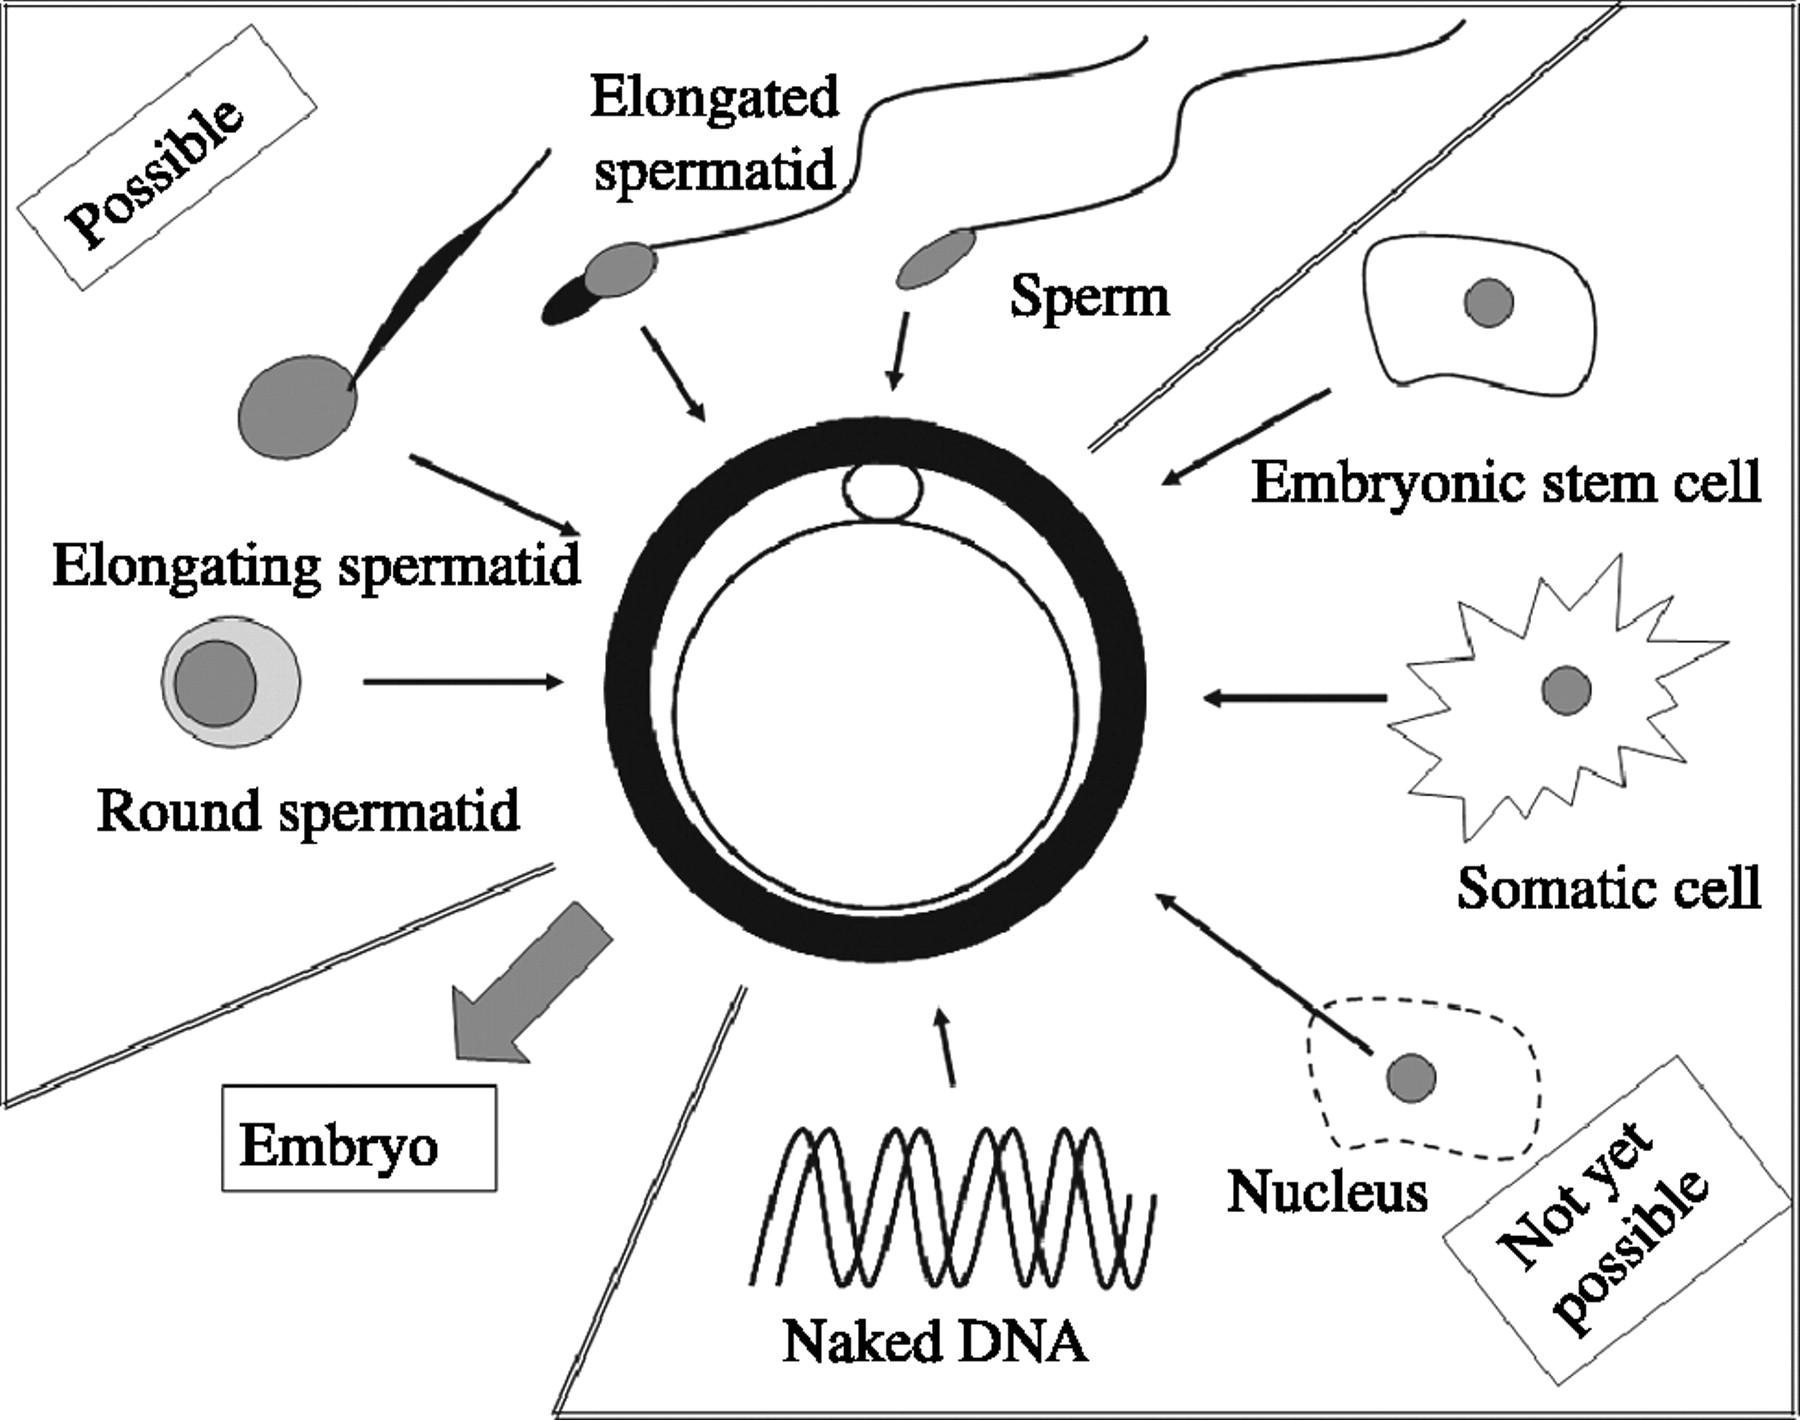 Potential scenarios to induce fertilization.